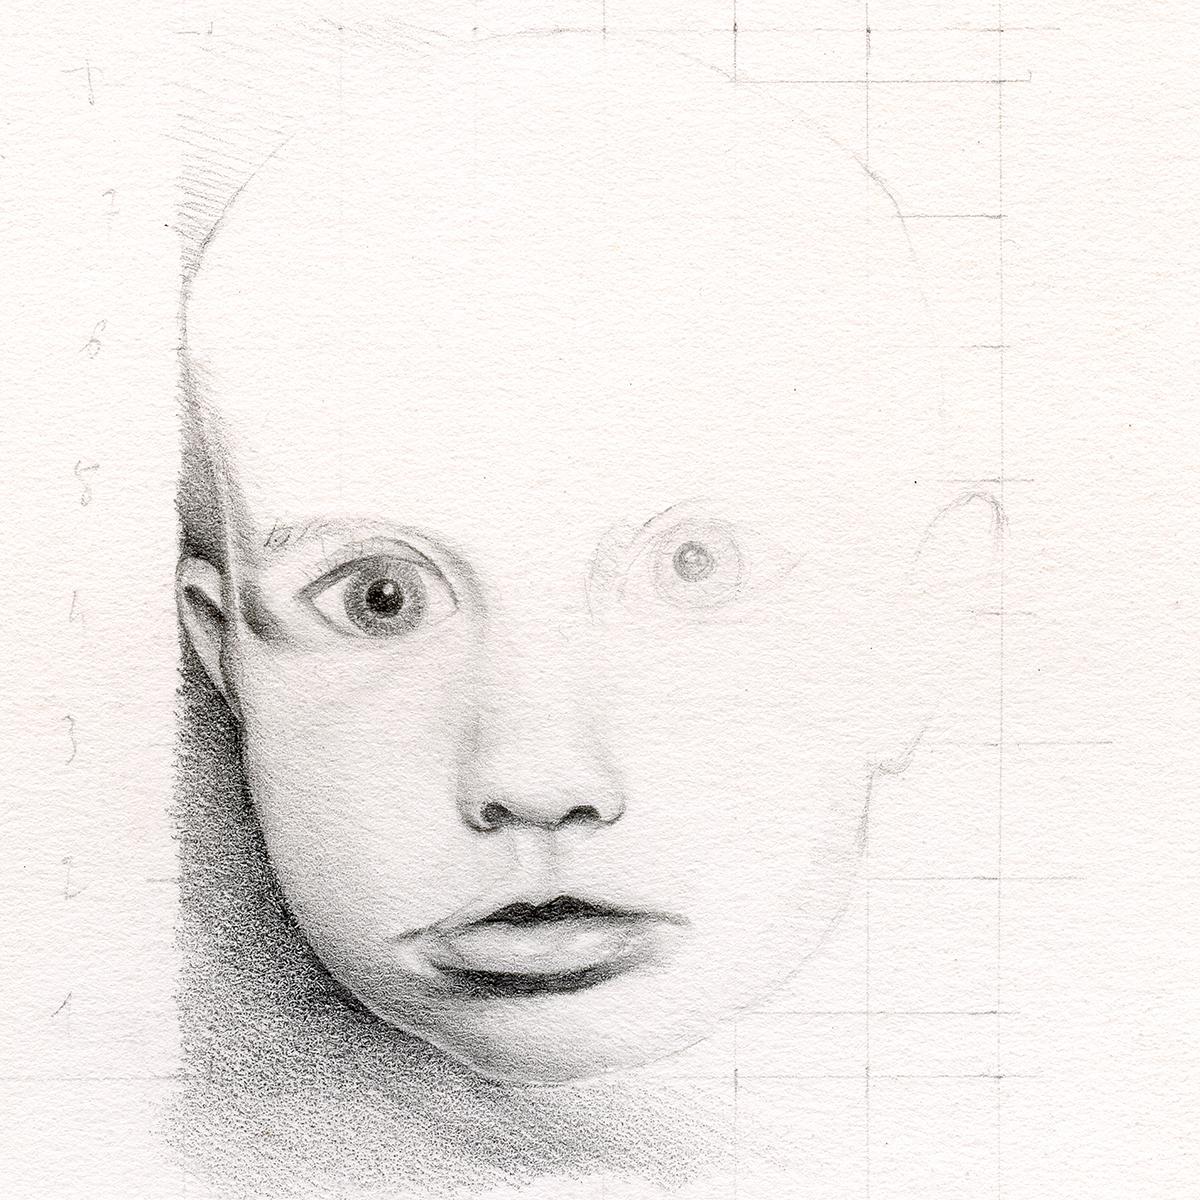 dessin-mesurer le vivant